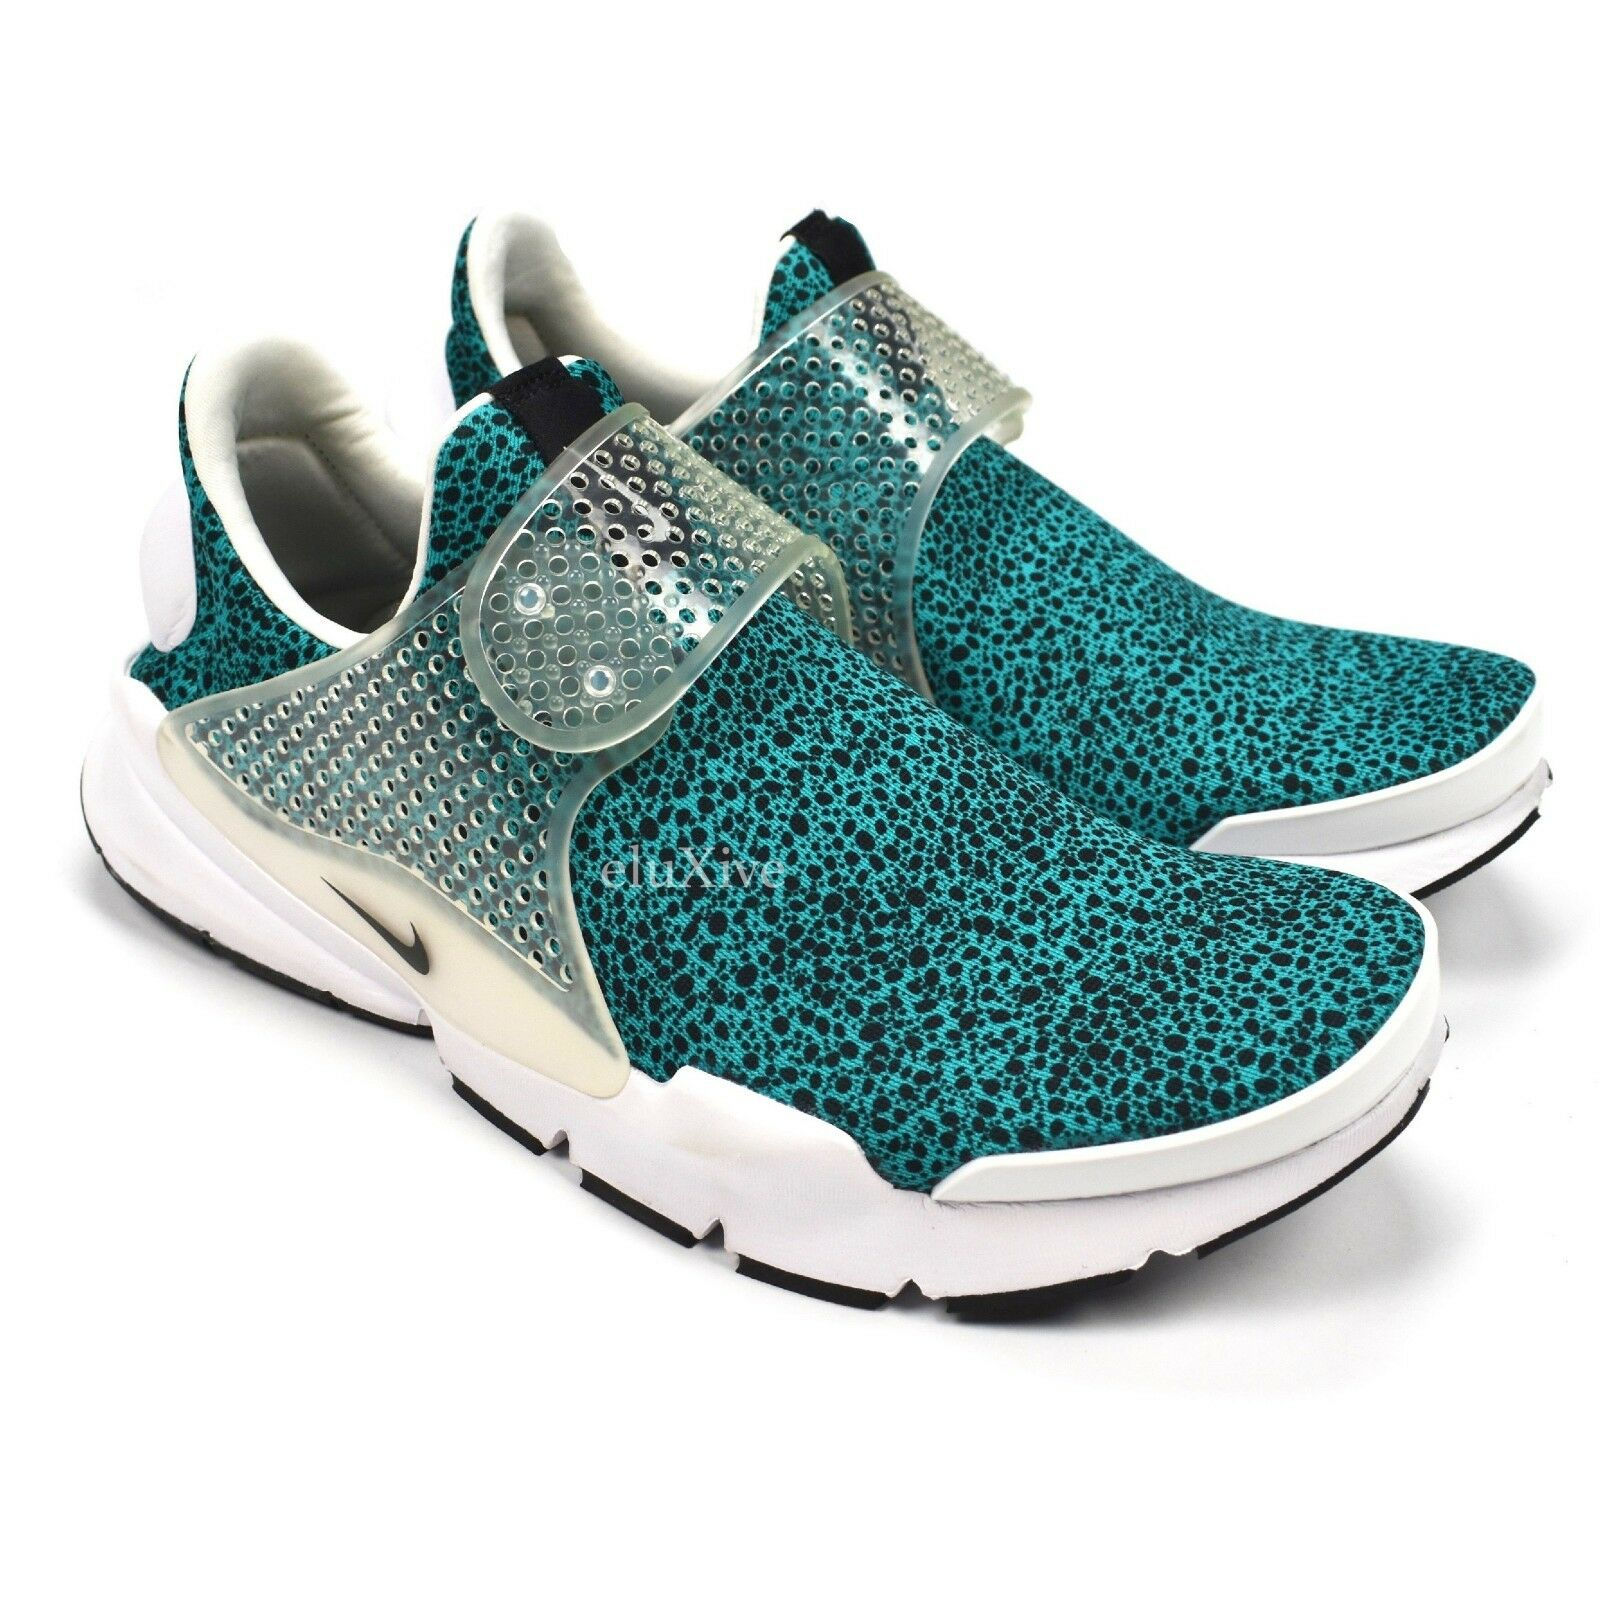 Nuove nike safari uomini 'sock dardo qs safari nike turbo verde turchese   scarpe 2017 10 17b86b